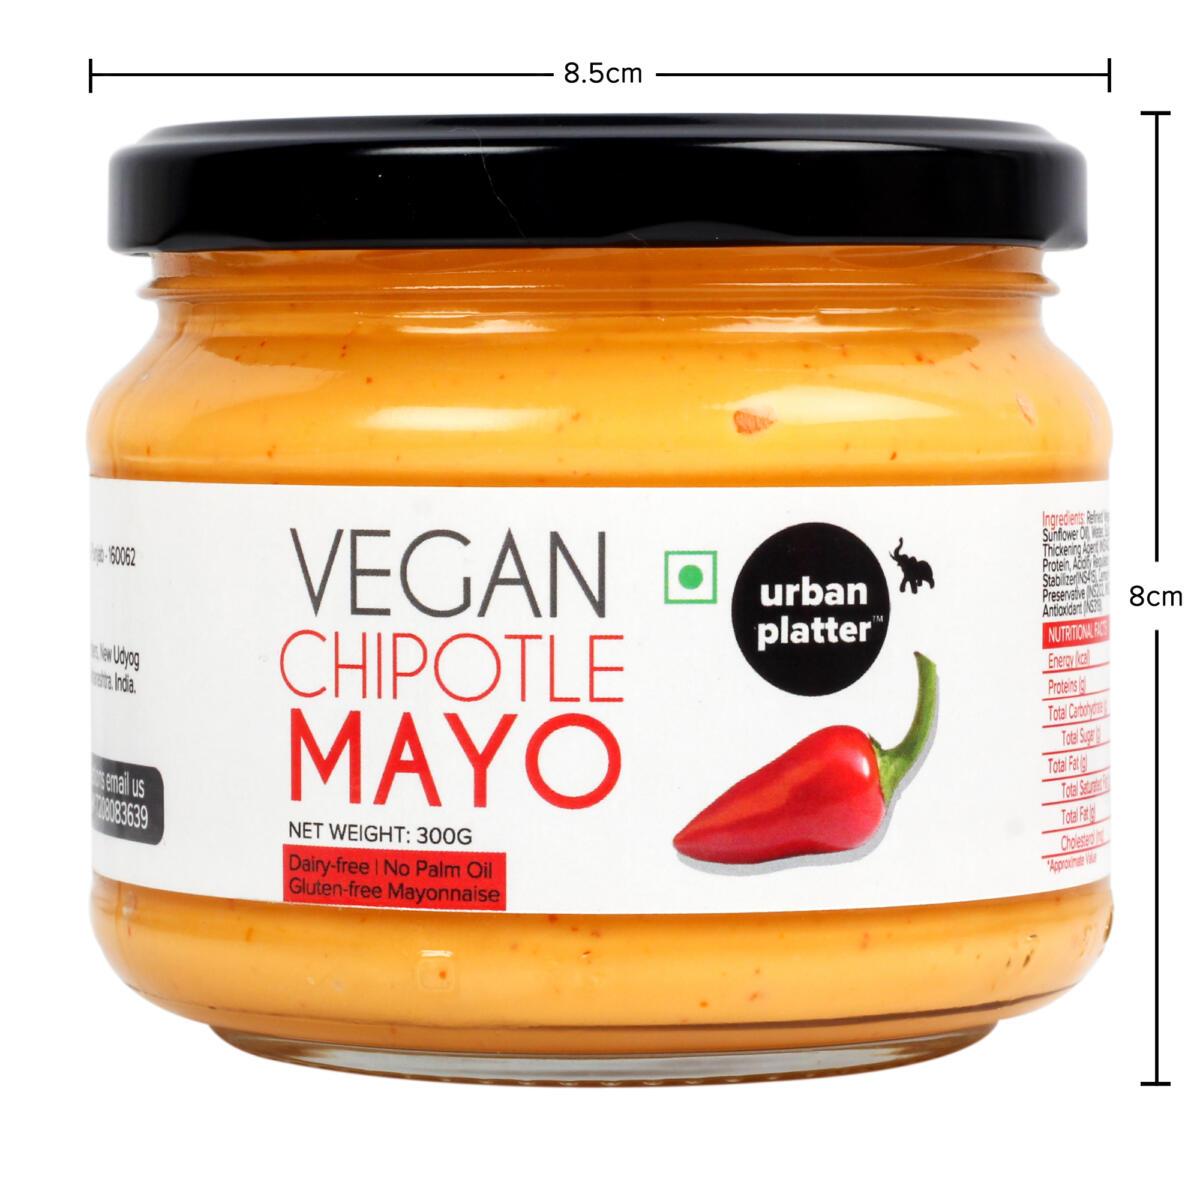 Urban Platter Vegan Chipotle Mayo 300g 10 6oz Dairy Free Mayonnaise No Palm Oil No Trans Fat Urban Platter